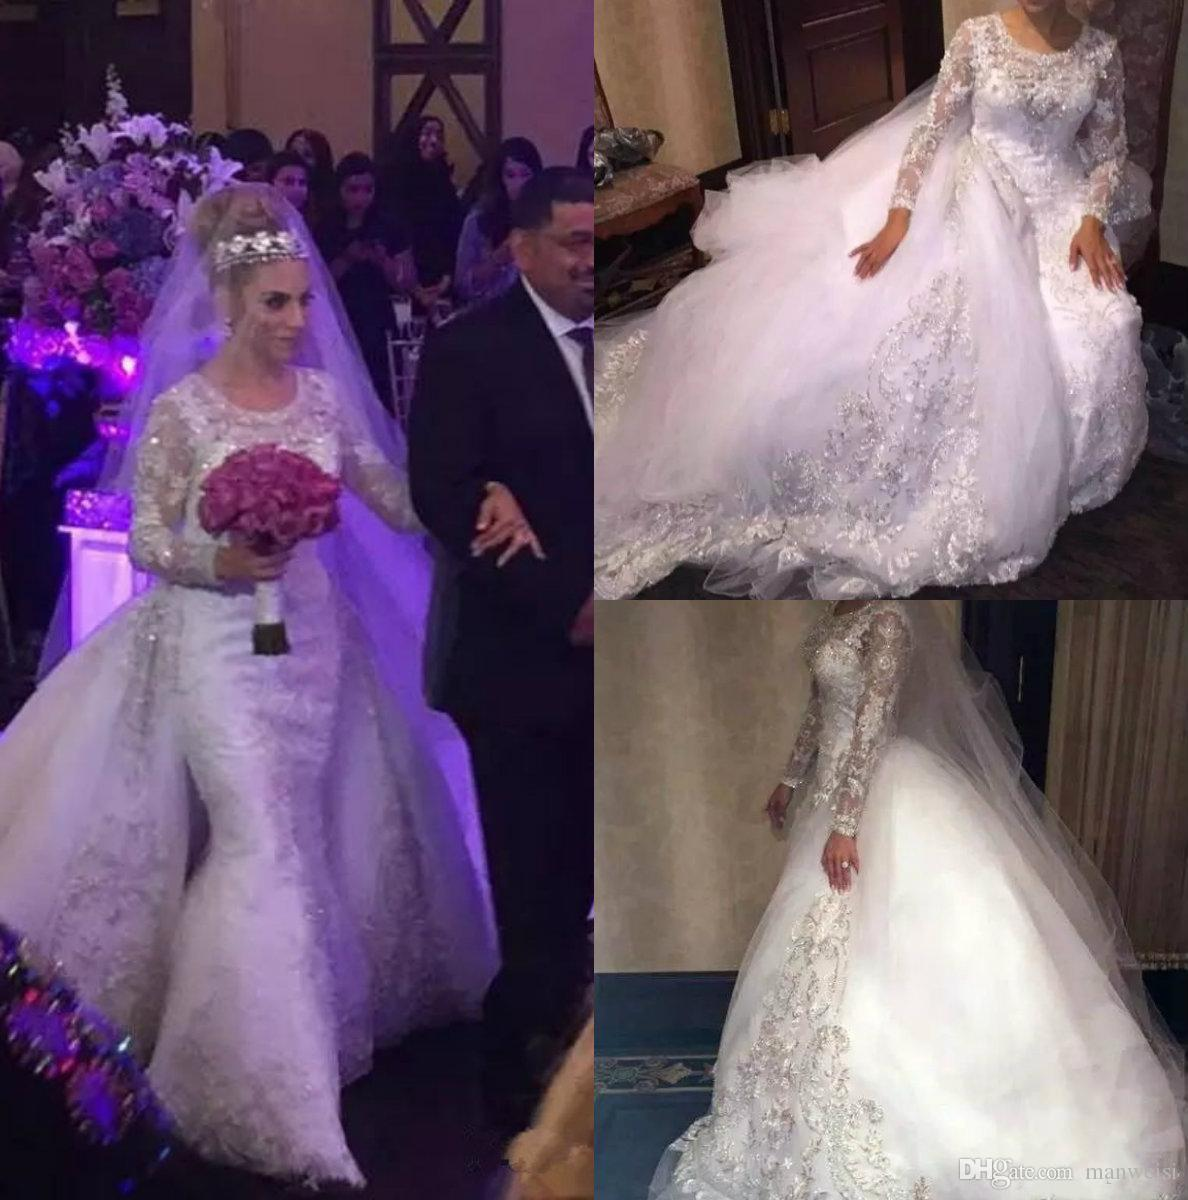 Modest Mermaid 2019 Lace Wedding Dresses With Detachable Train Long Sleeve Appliqued Beads Wedding Gowns Bridal Dress Vestidos De Nnovia